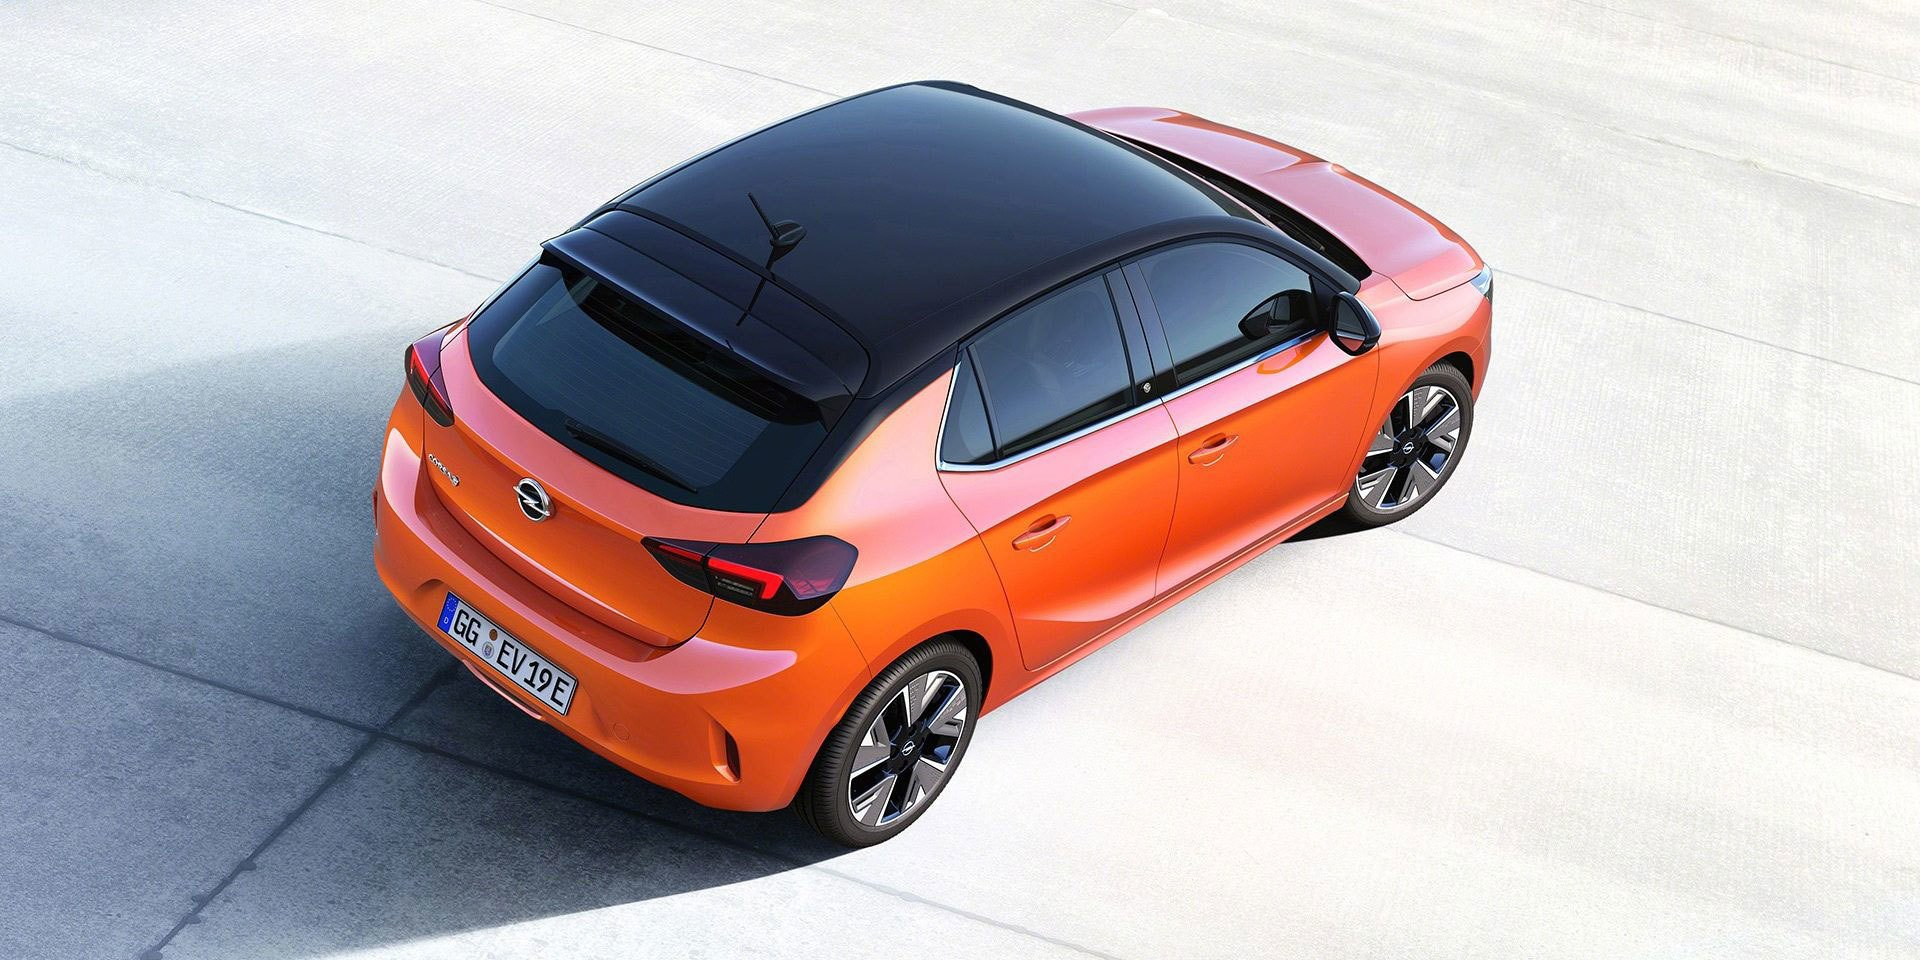 2020-Opel-Corsa-leaked-5